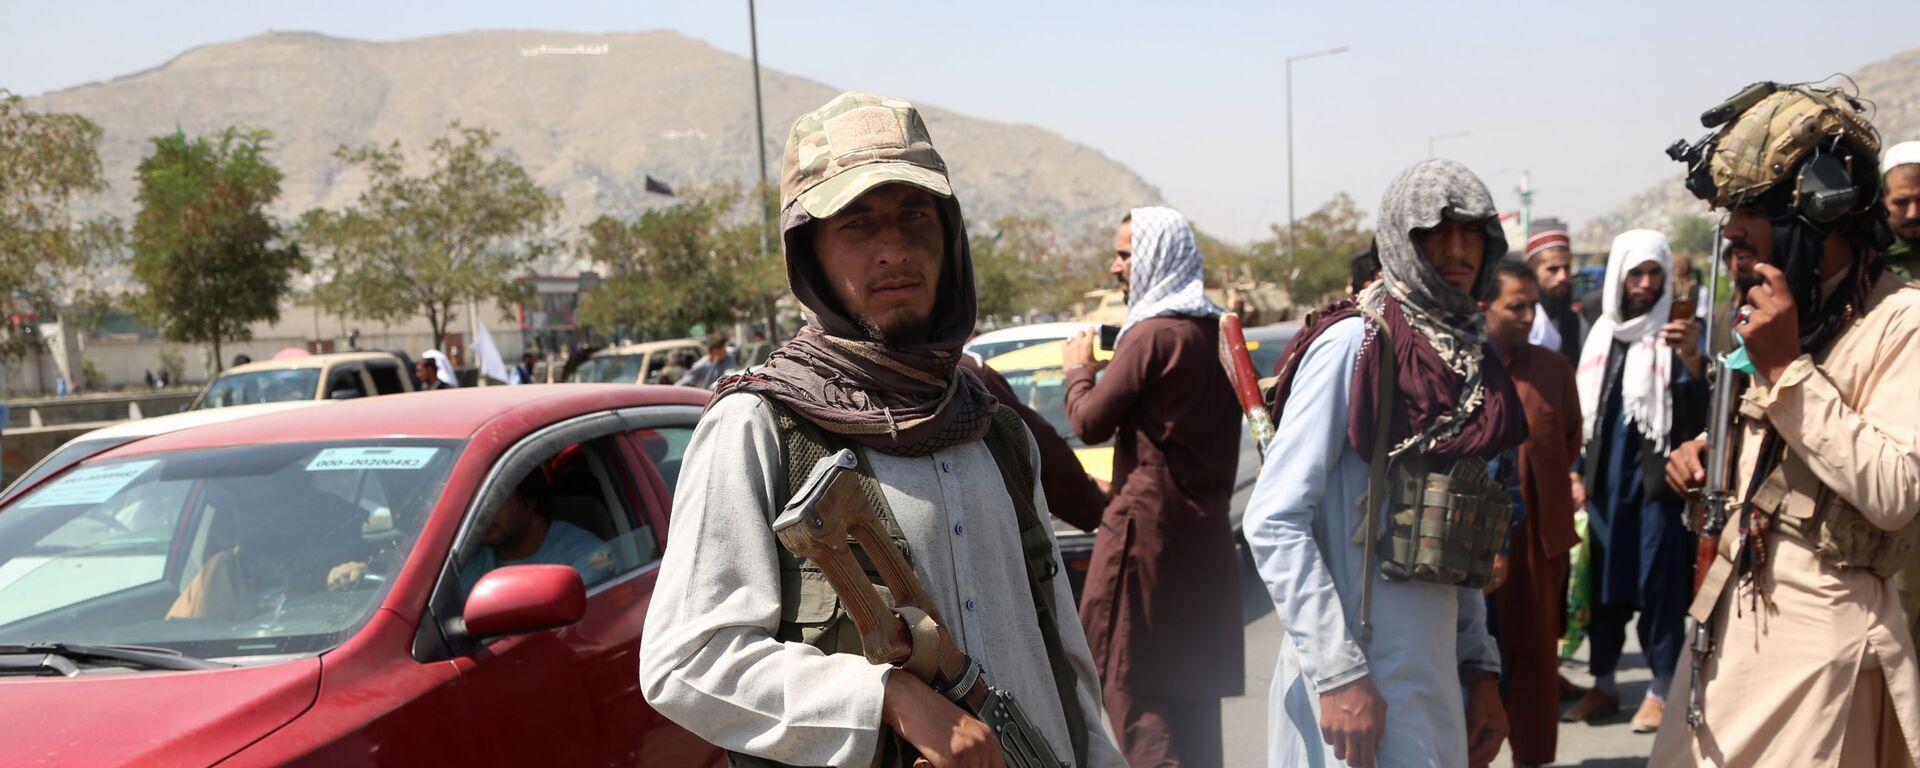 Боевики движения Талибан в Кабуле (16 августа 2021). Афганистан - Sputnik Армения, 1920, 27.08.2021